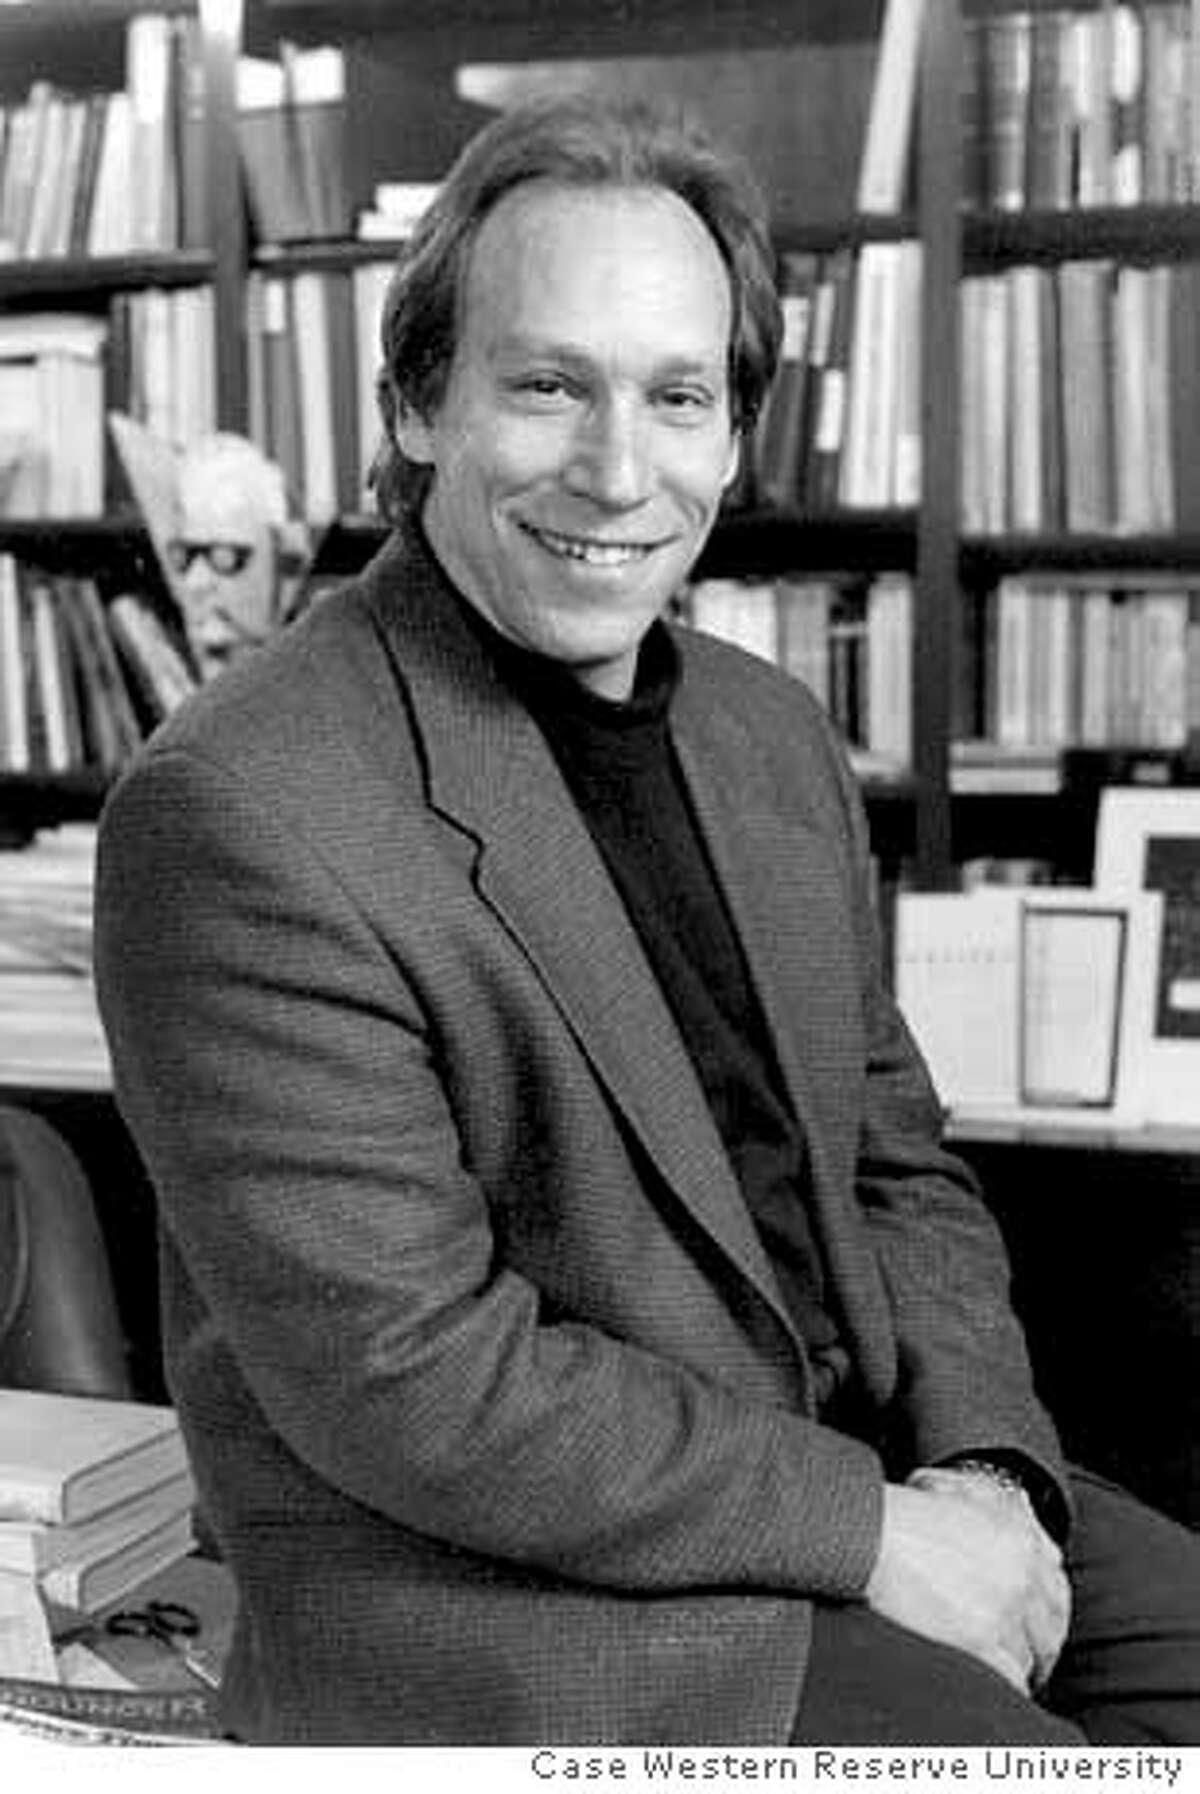 Photo of astrophysicist Lawrence Krauss of Case Western Reserve University. Photo: Courtesy of Case Western Reserve University